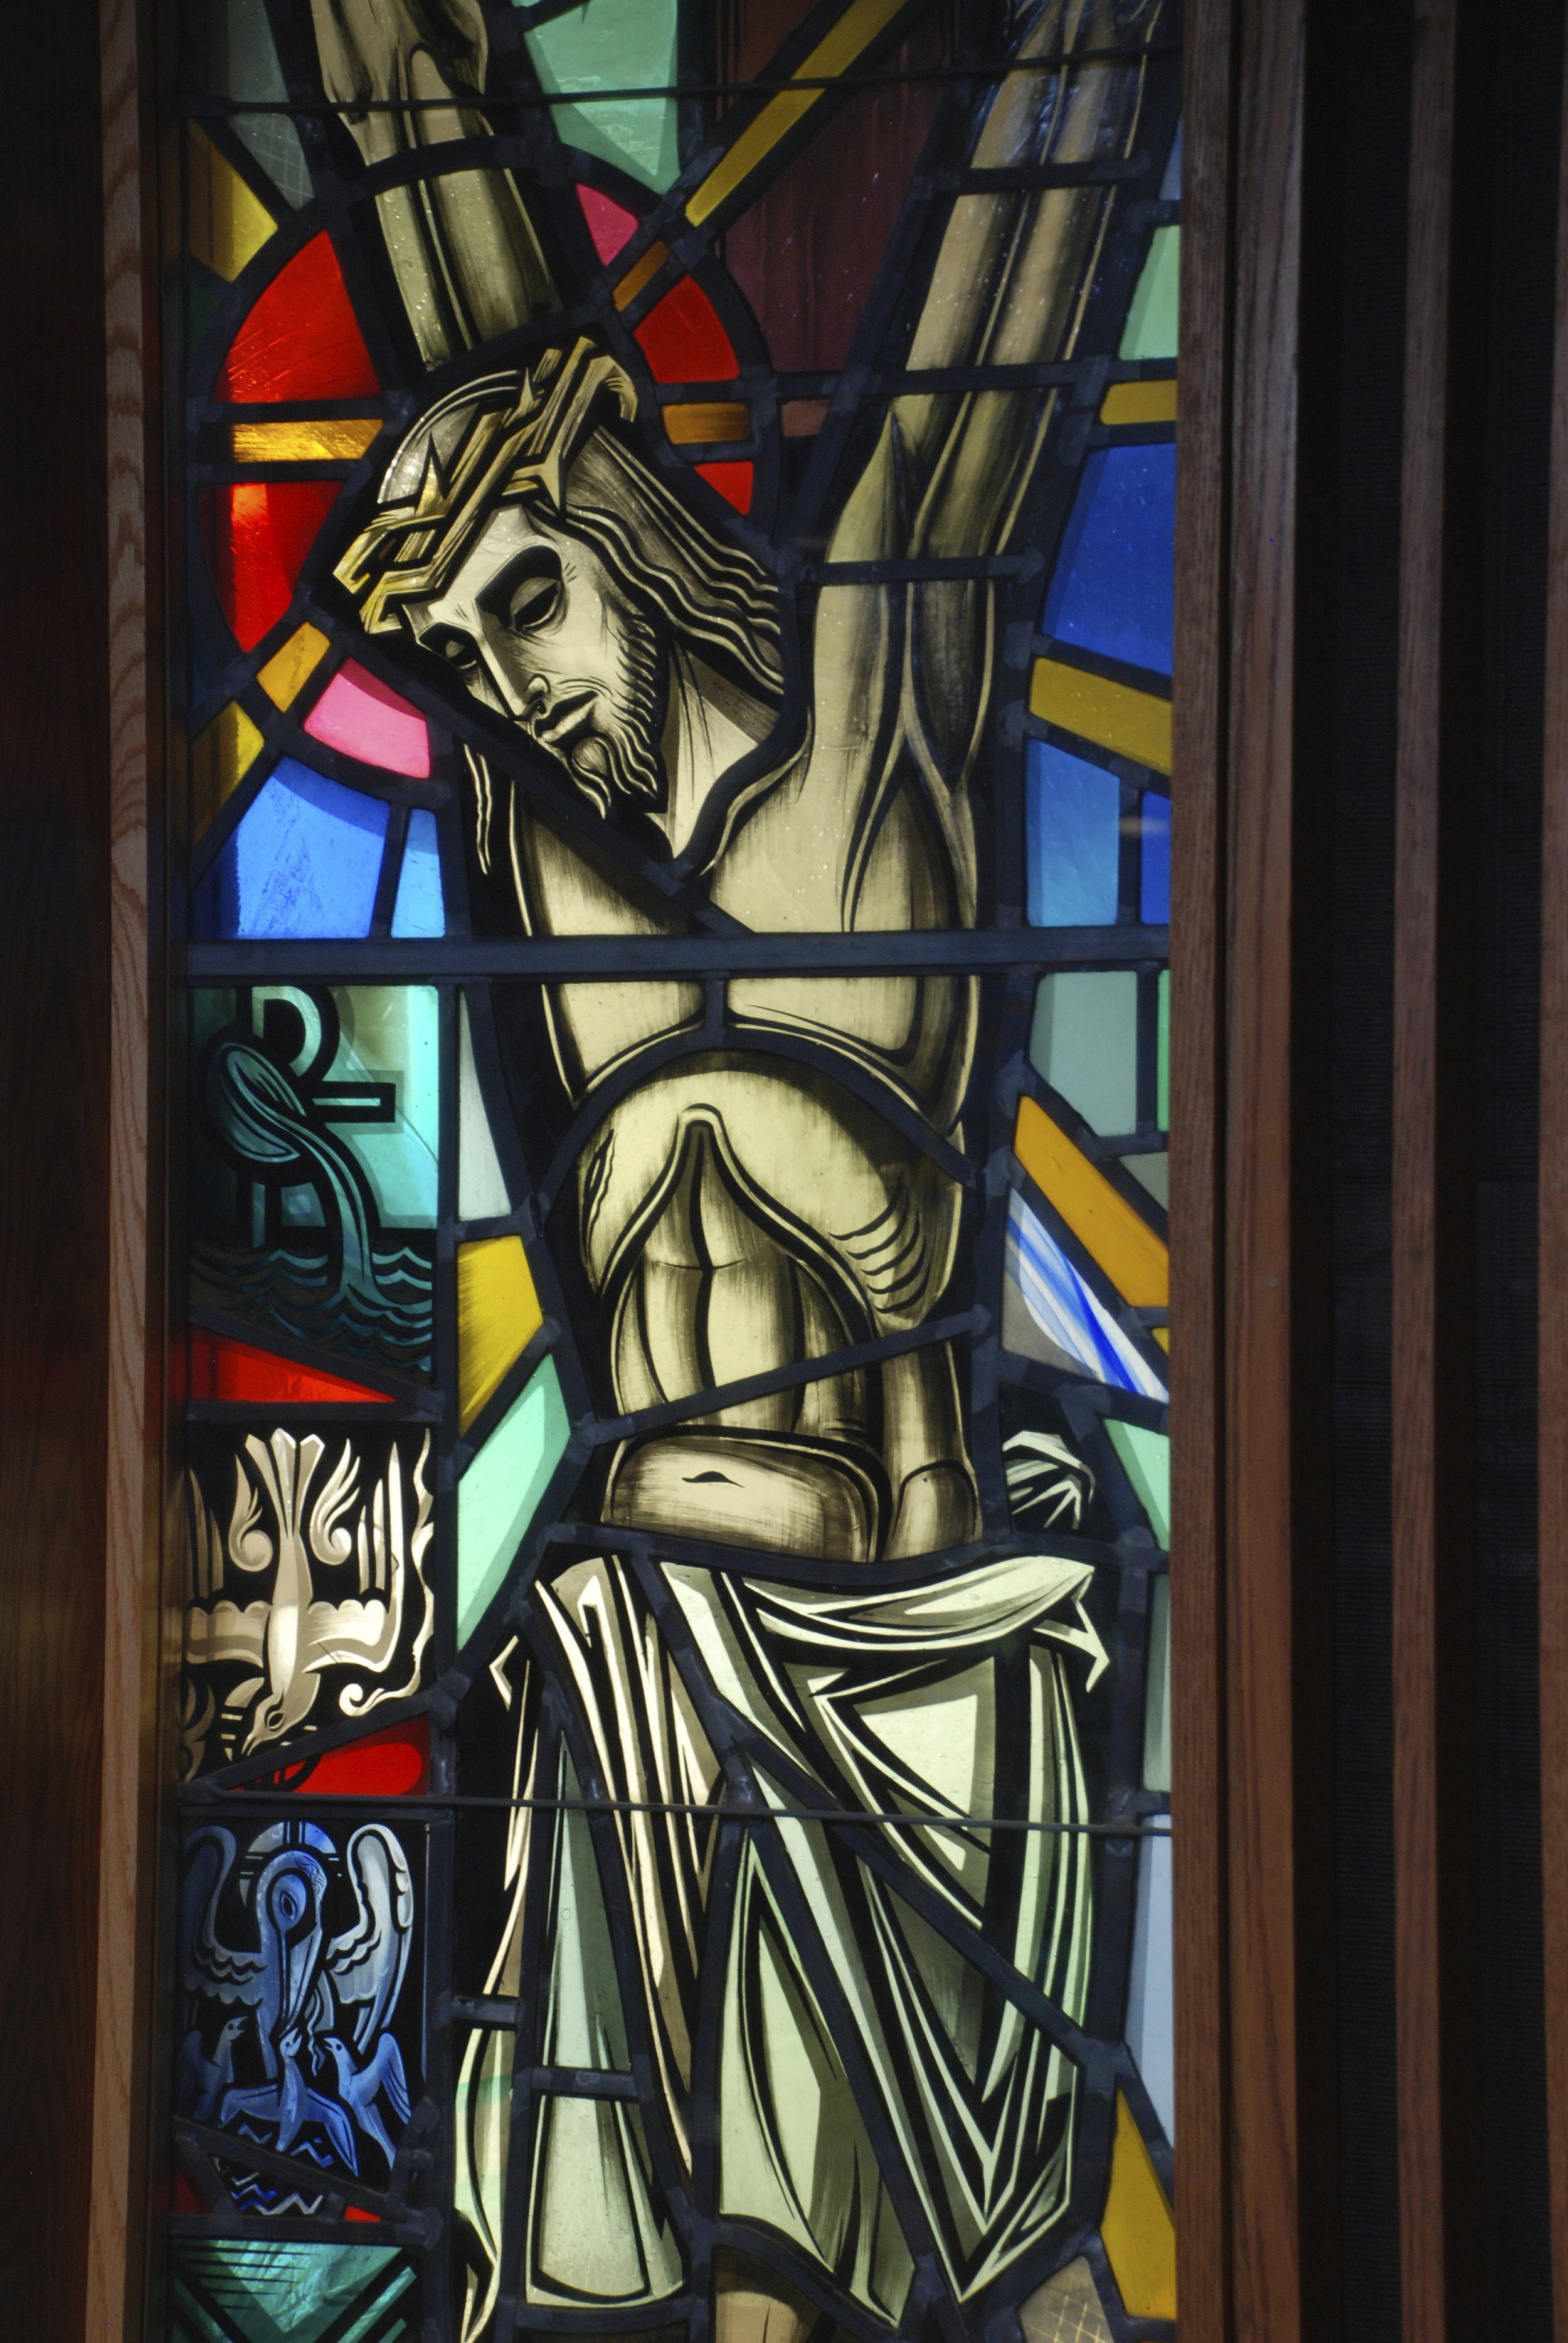 Dowling Chapel - Des Moines, IA